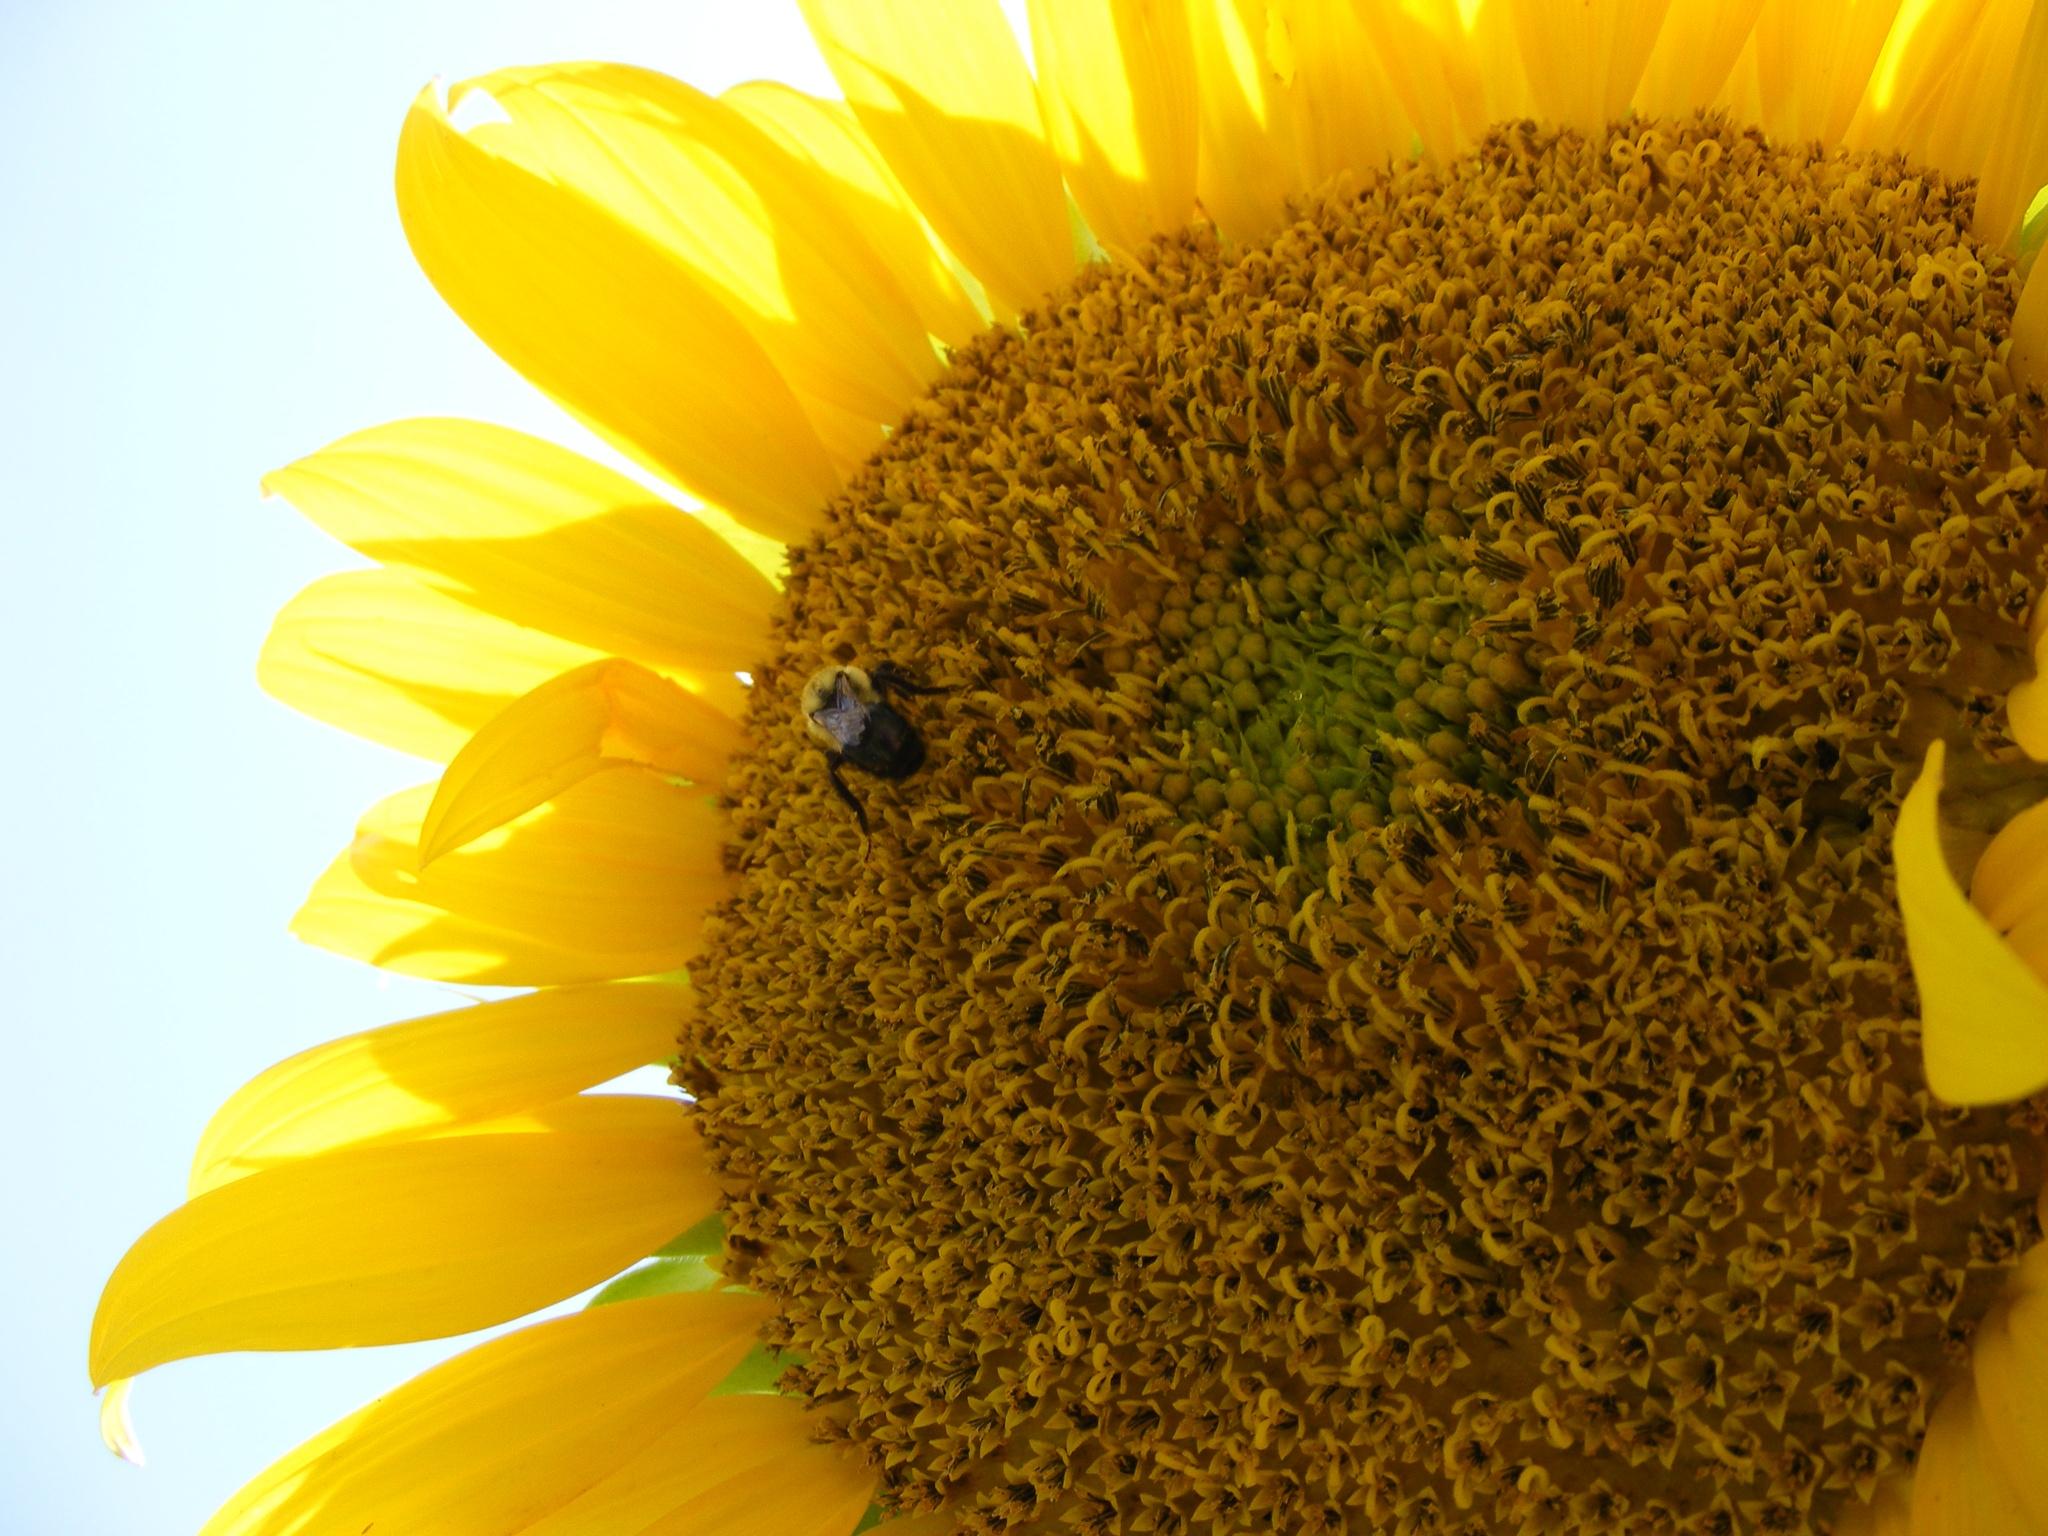 Bee on Sunflower by Alex Ingram